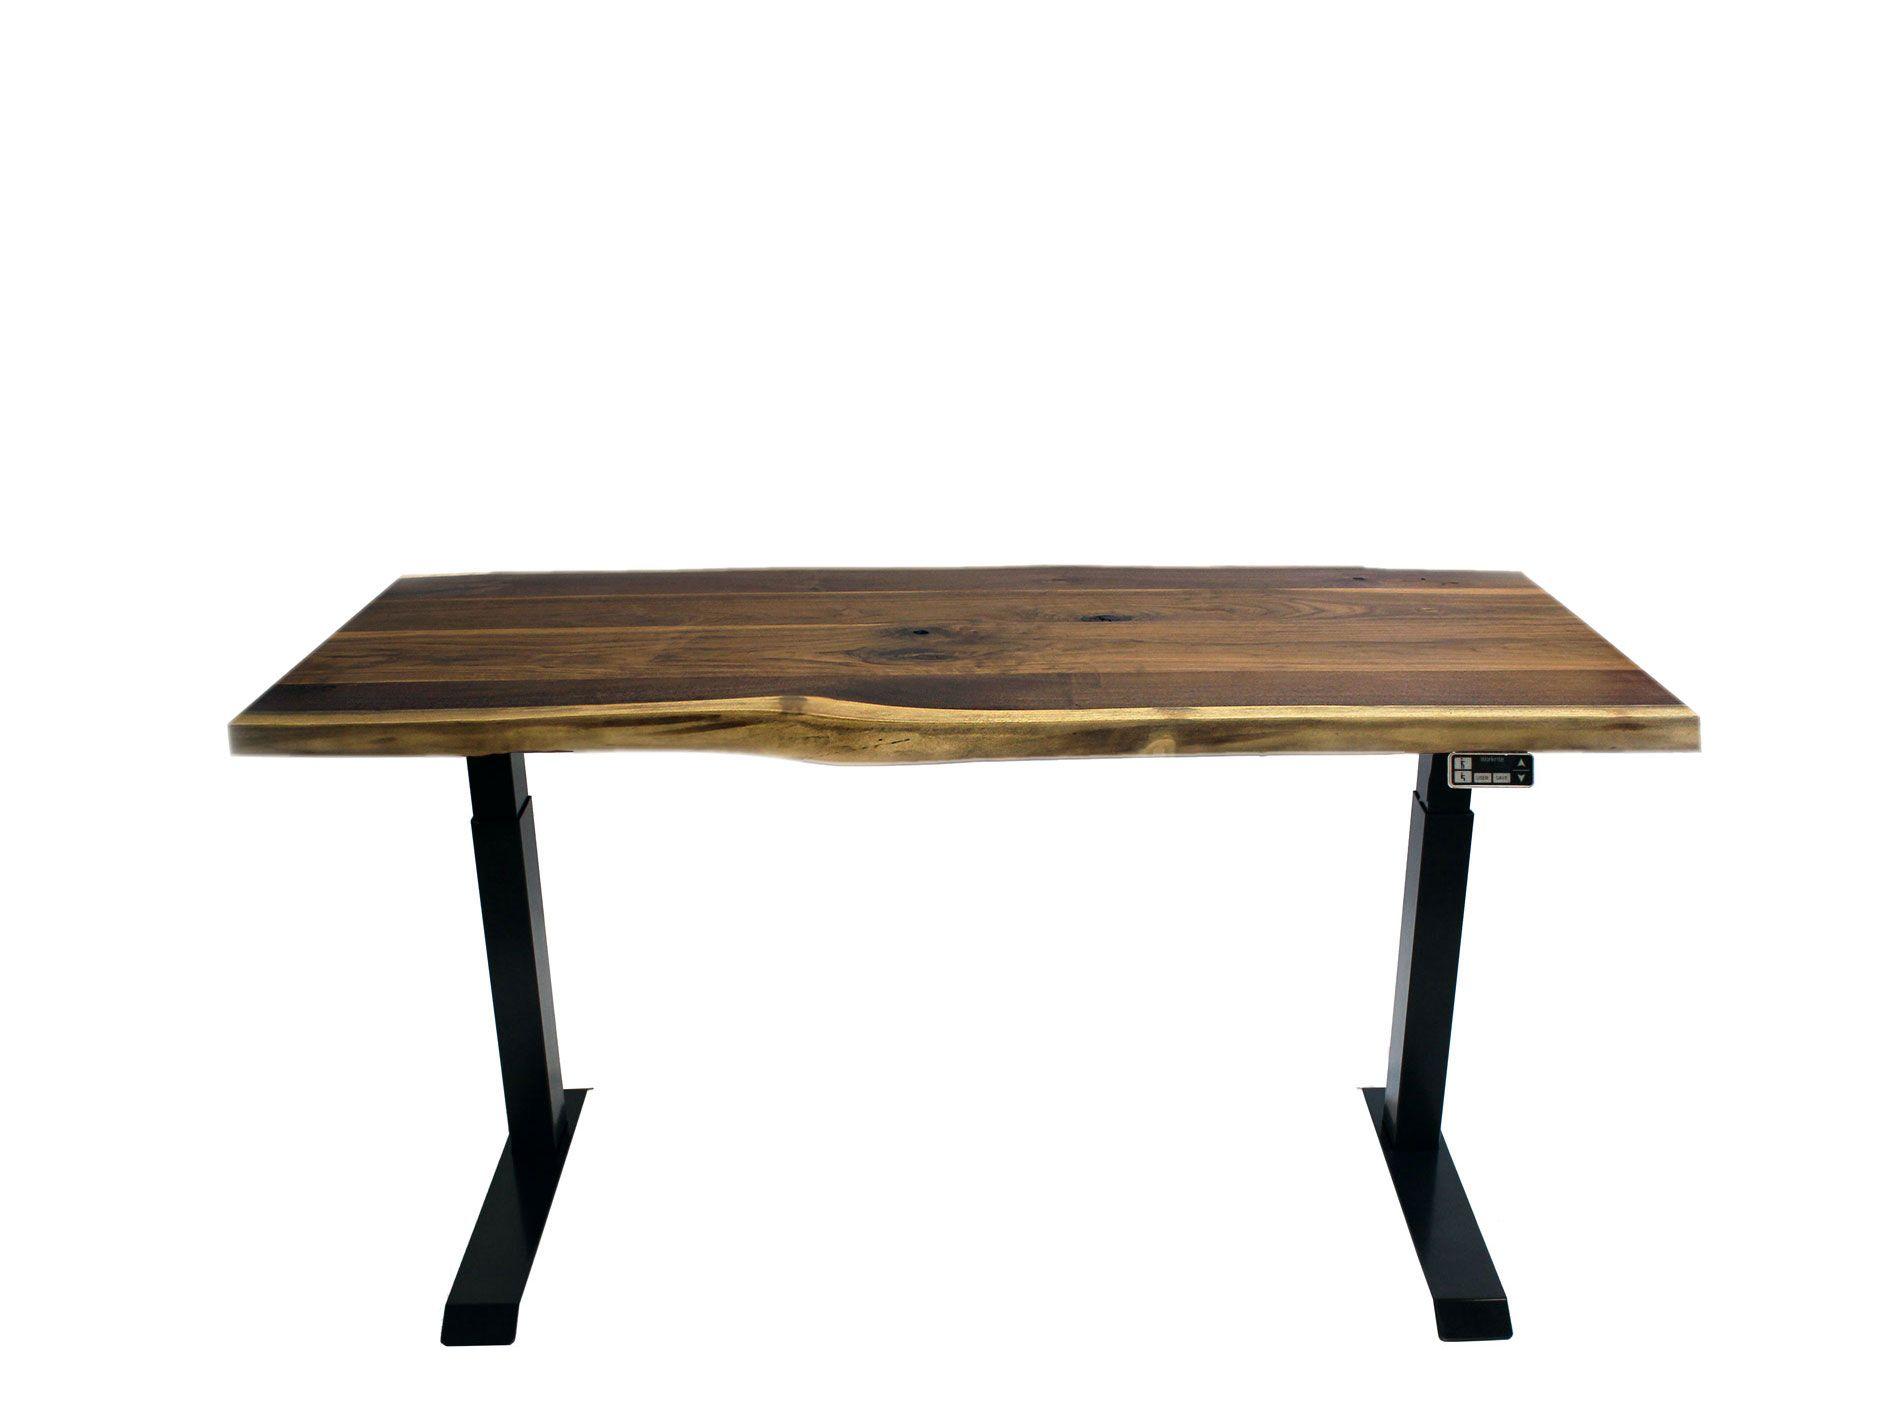 Zen Solid Rubberwood Sit Stand Desk Sit Stand Desk Electric Sit Stand Desk Adjustable Height Desk